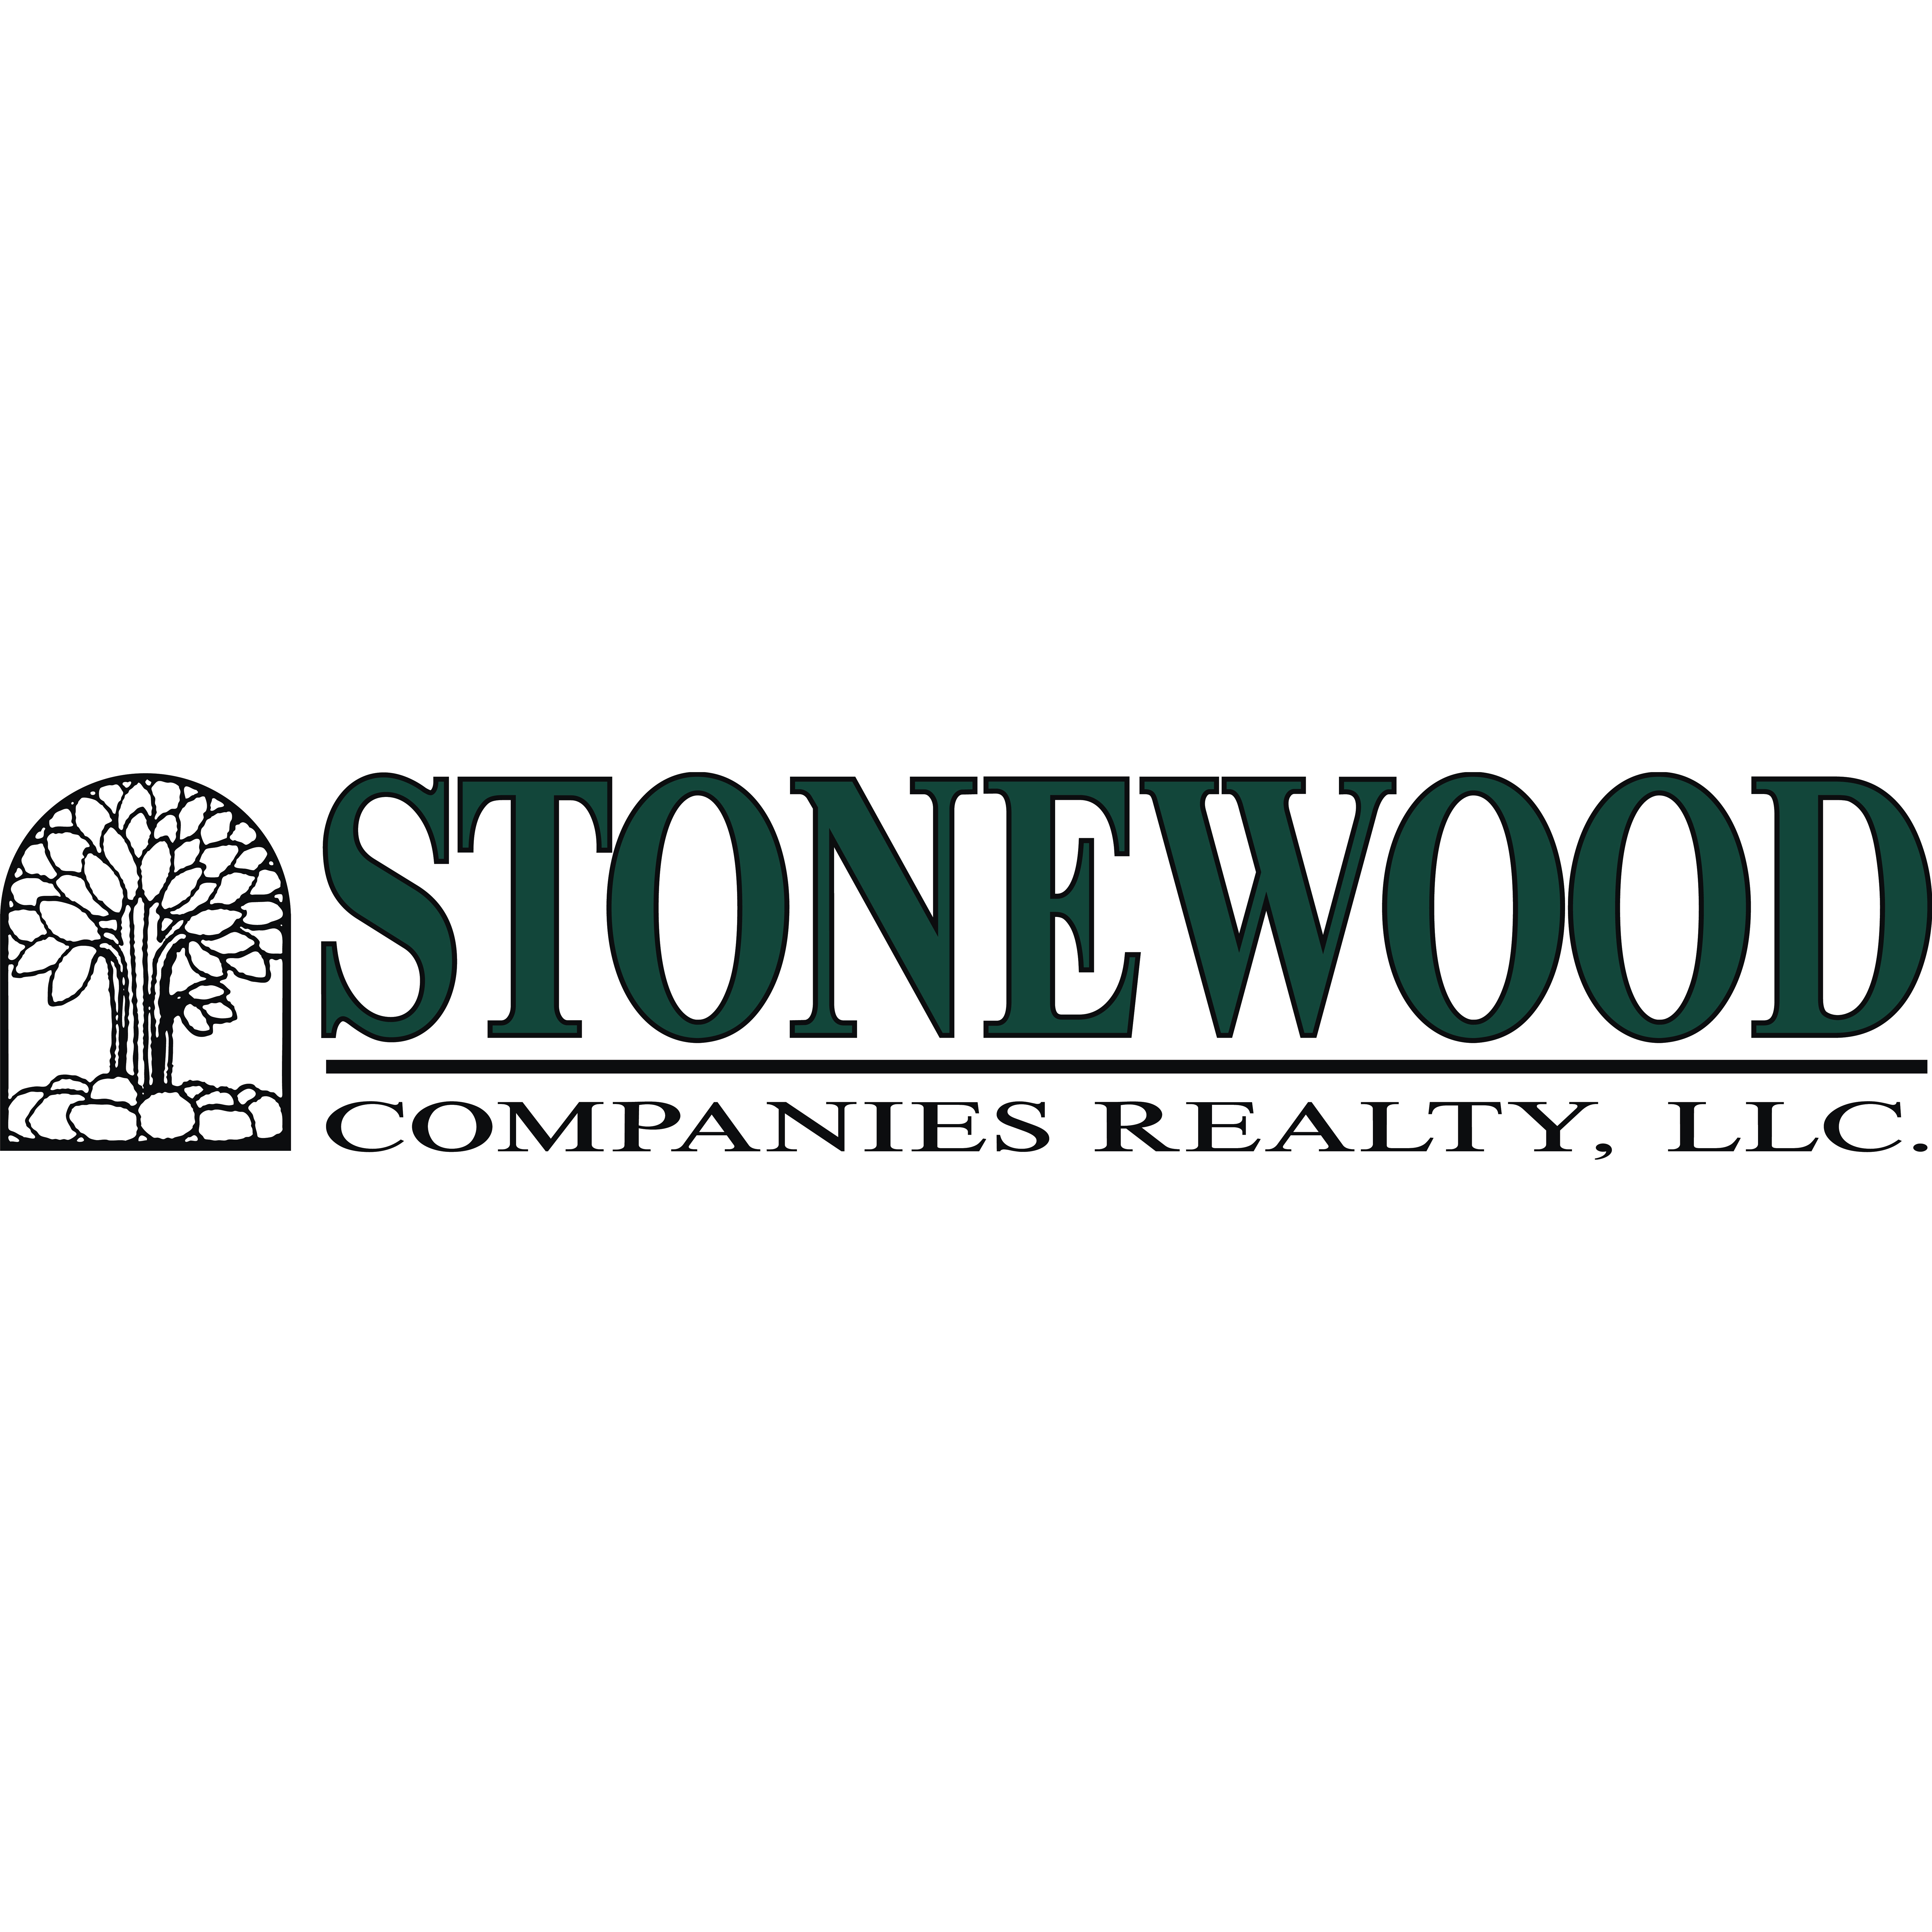 Stonewood Companies